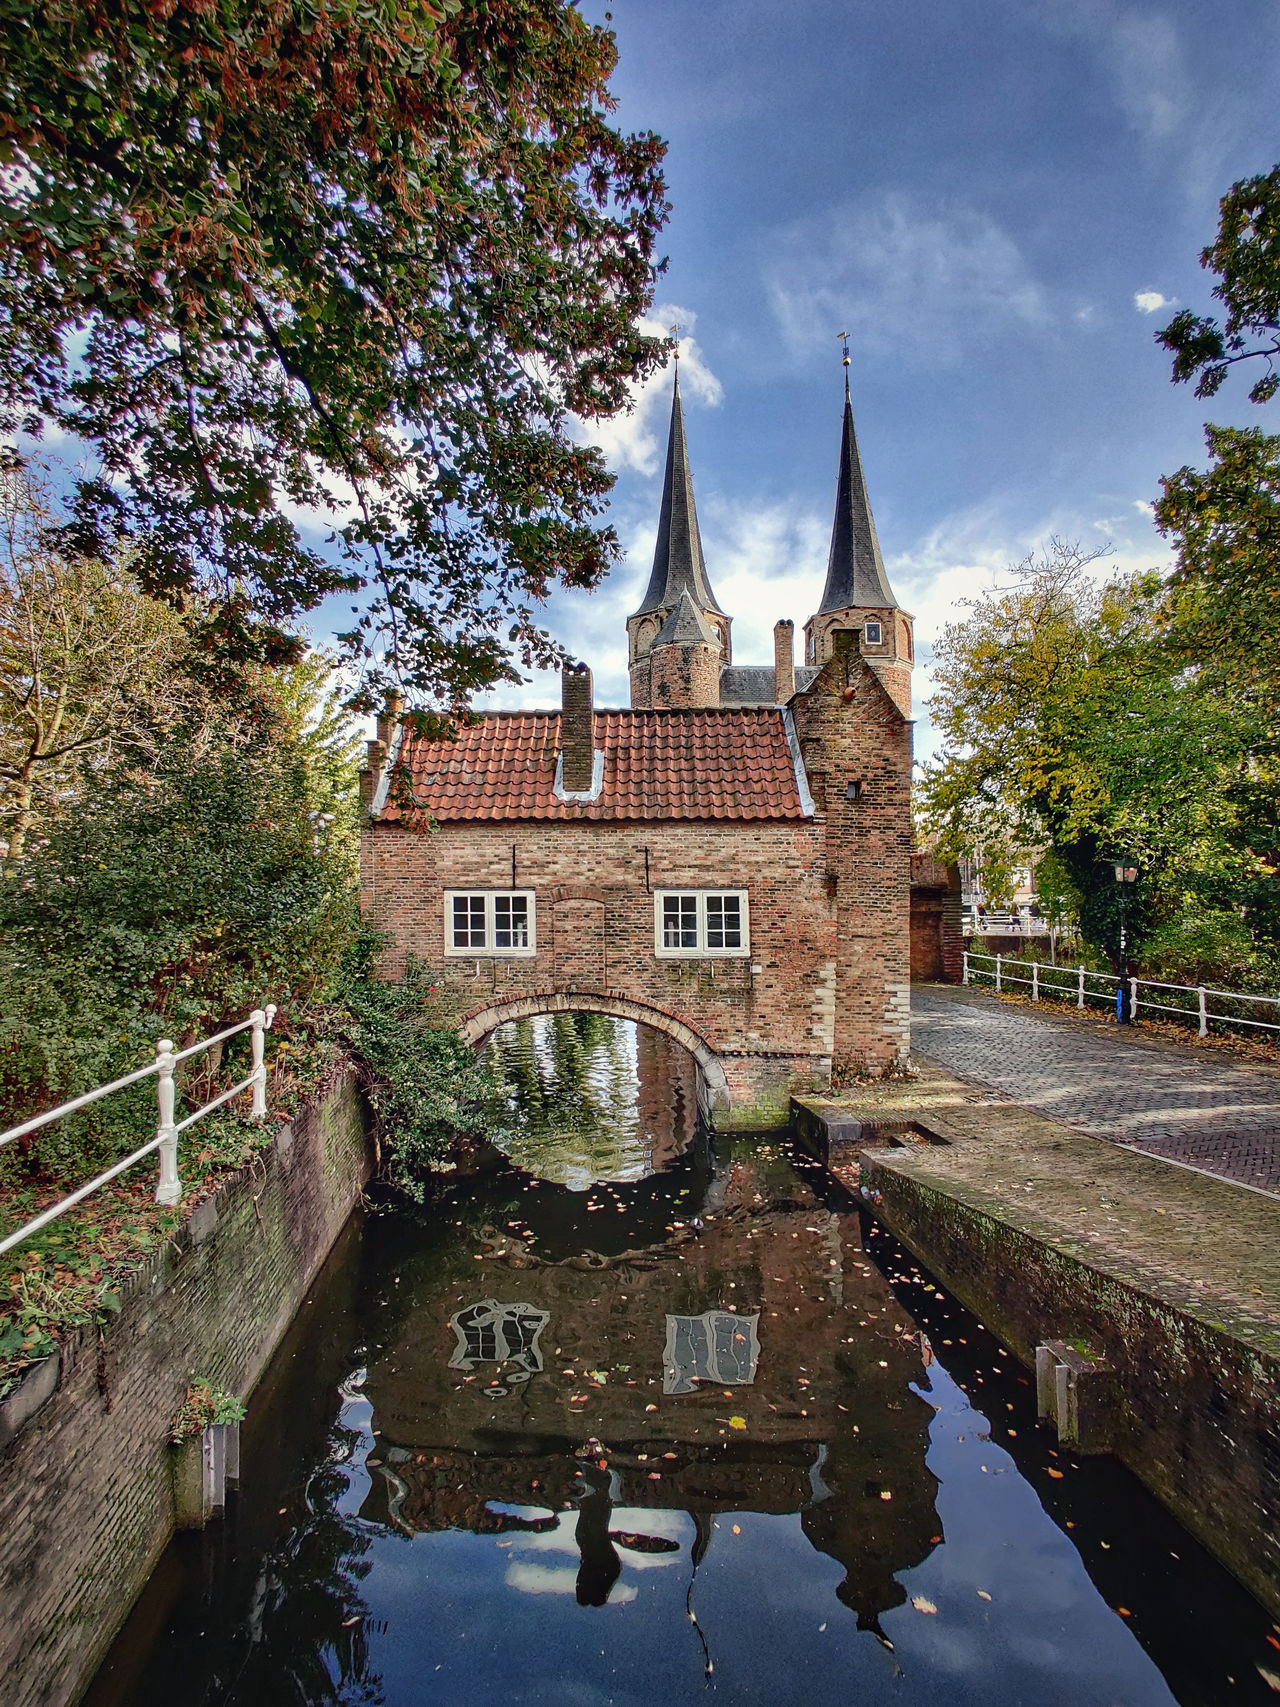 Delft stadspoort